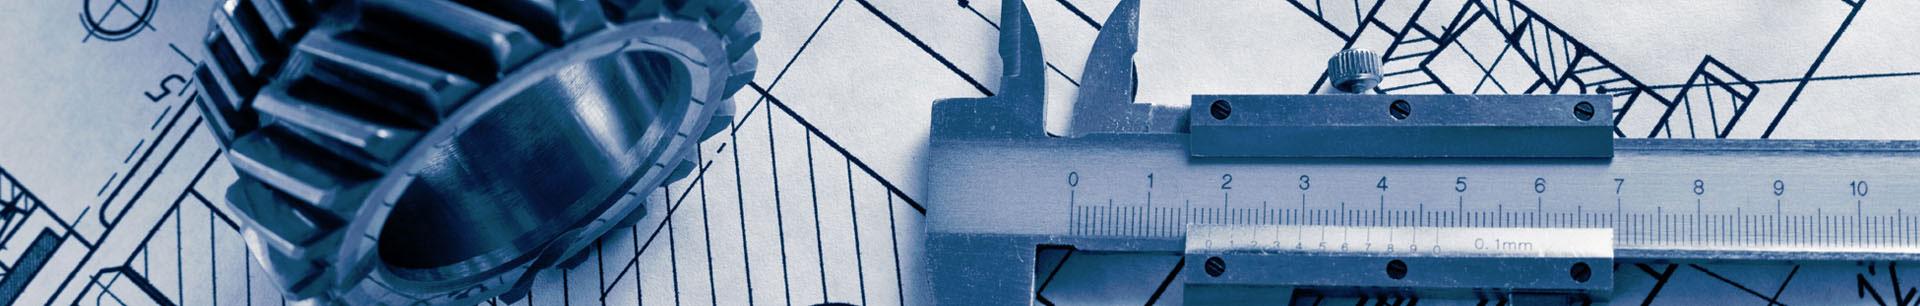 Manufacturing - Financing - Clip Financial